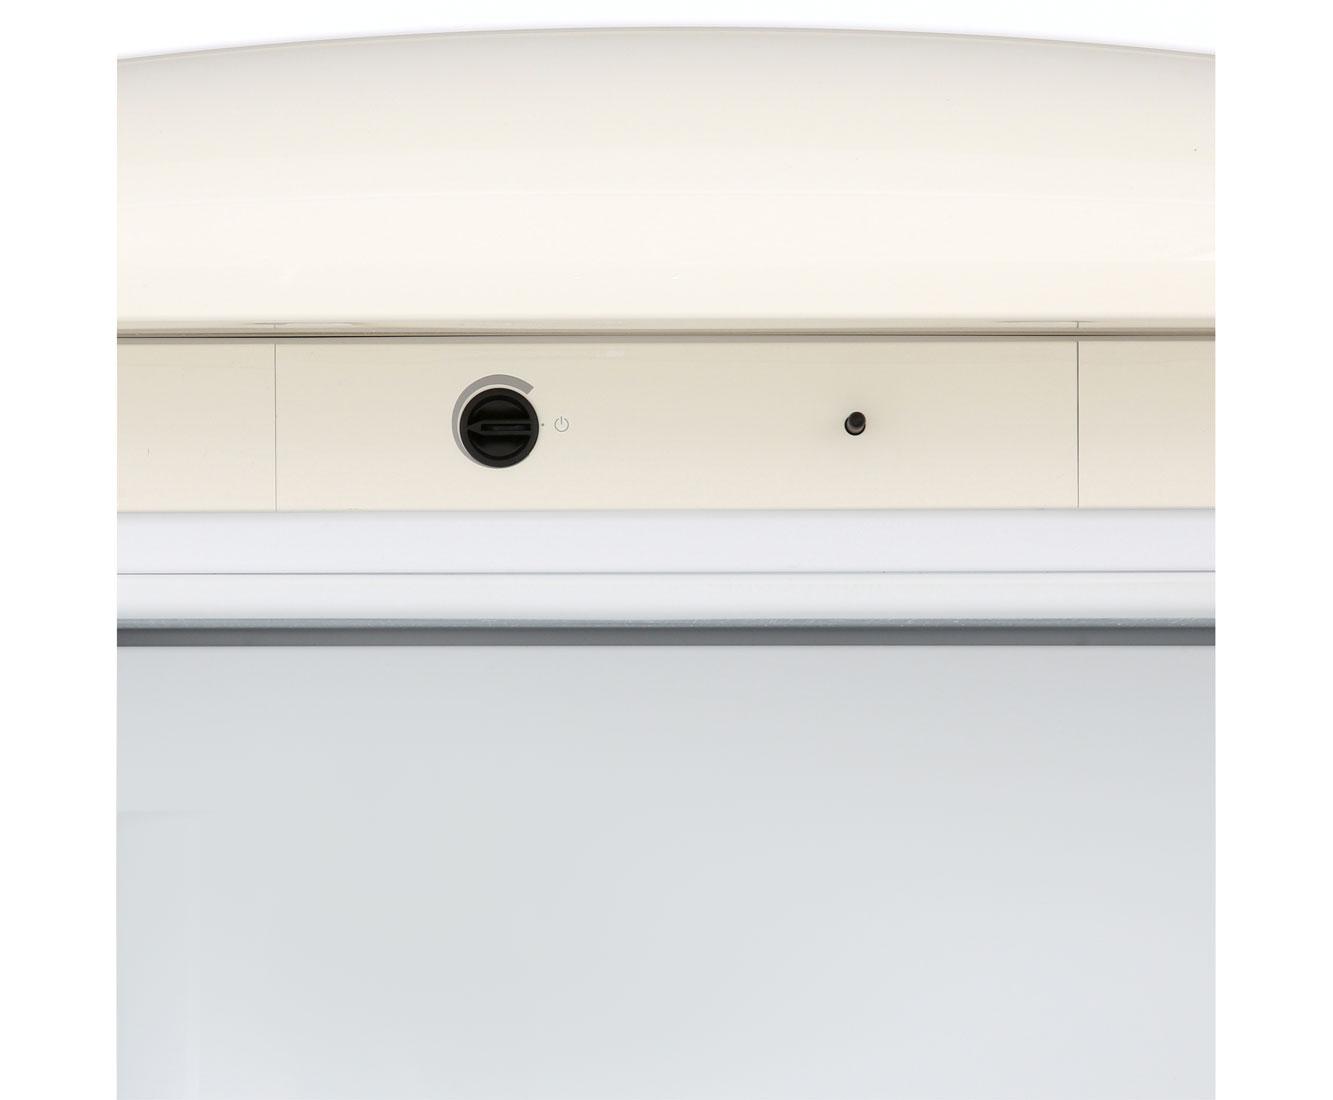 Gorenje Kühlschrank Vw Design : Gorenje retro vw kühlschrank himmelblau